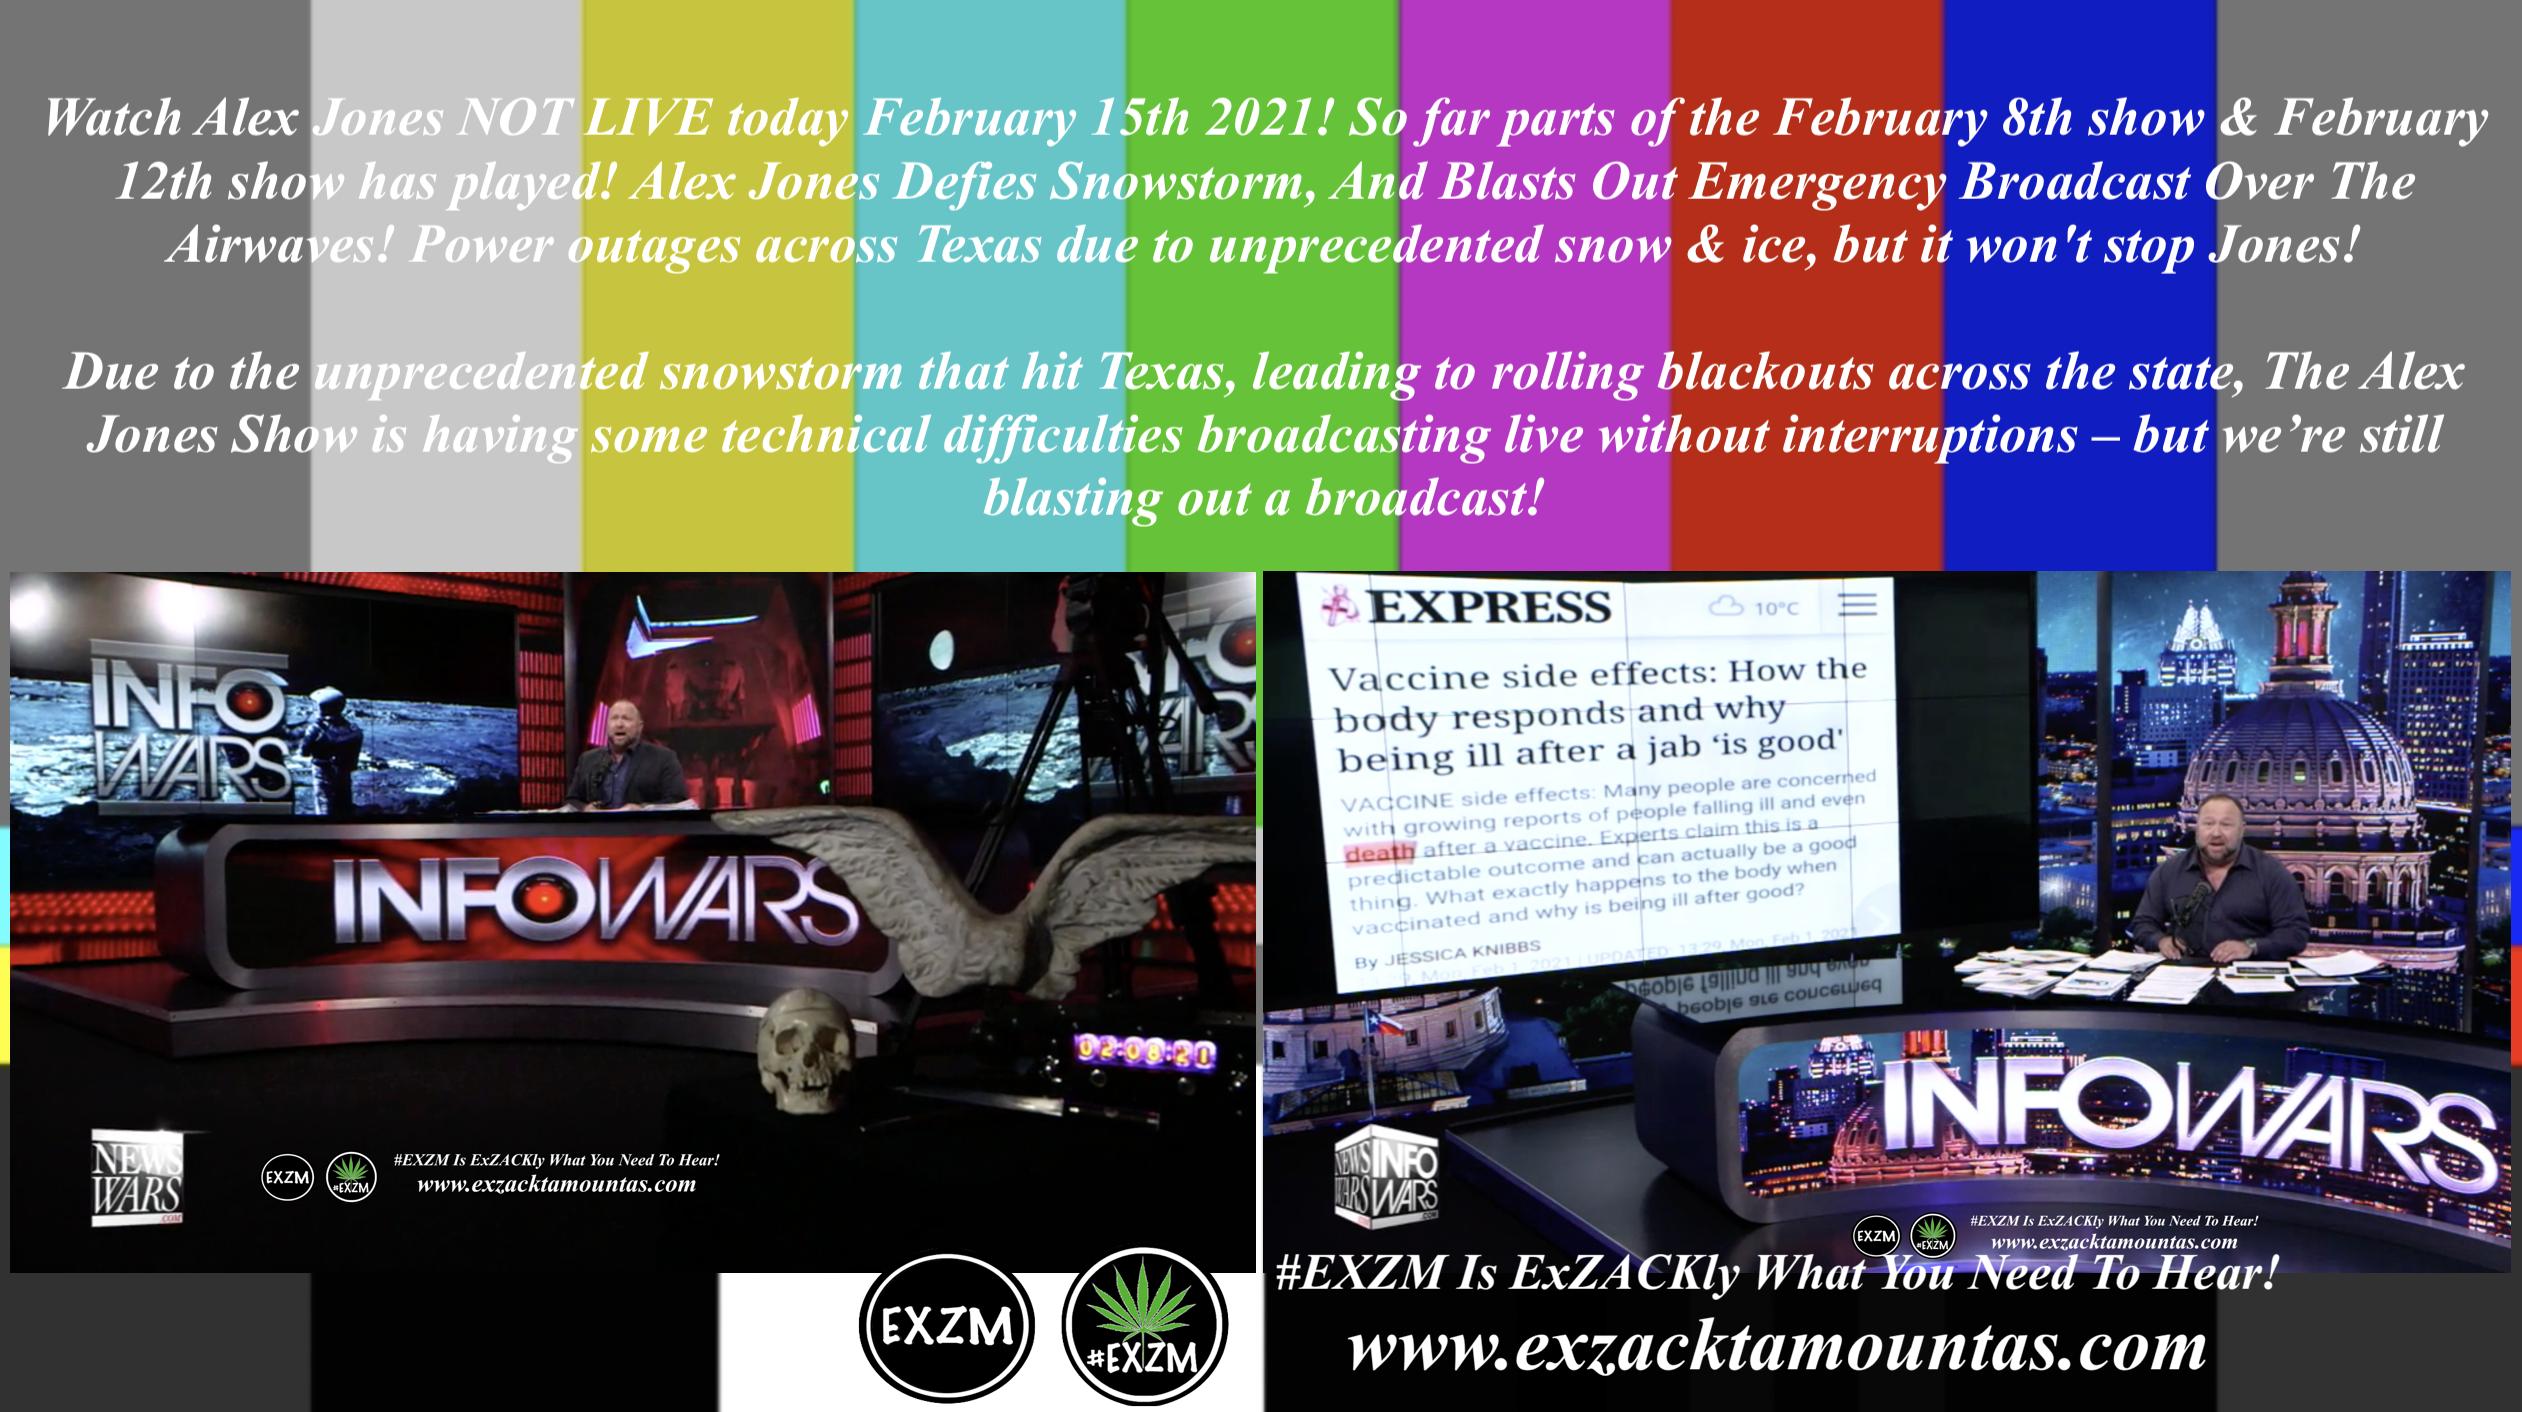 Alex Jones Infowars Studio EXZM Zack Mount February 15th 2021